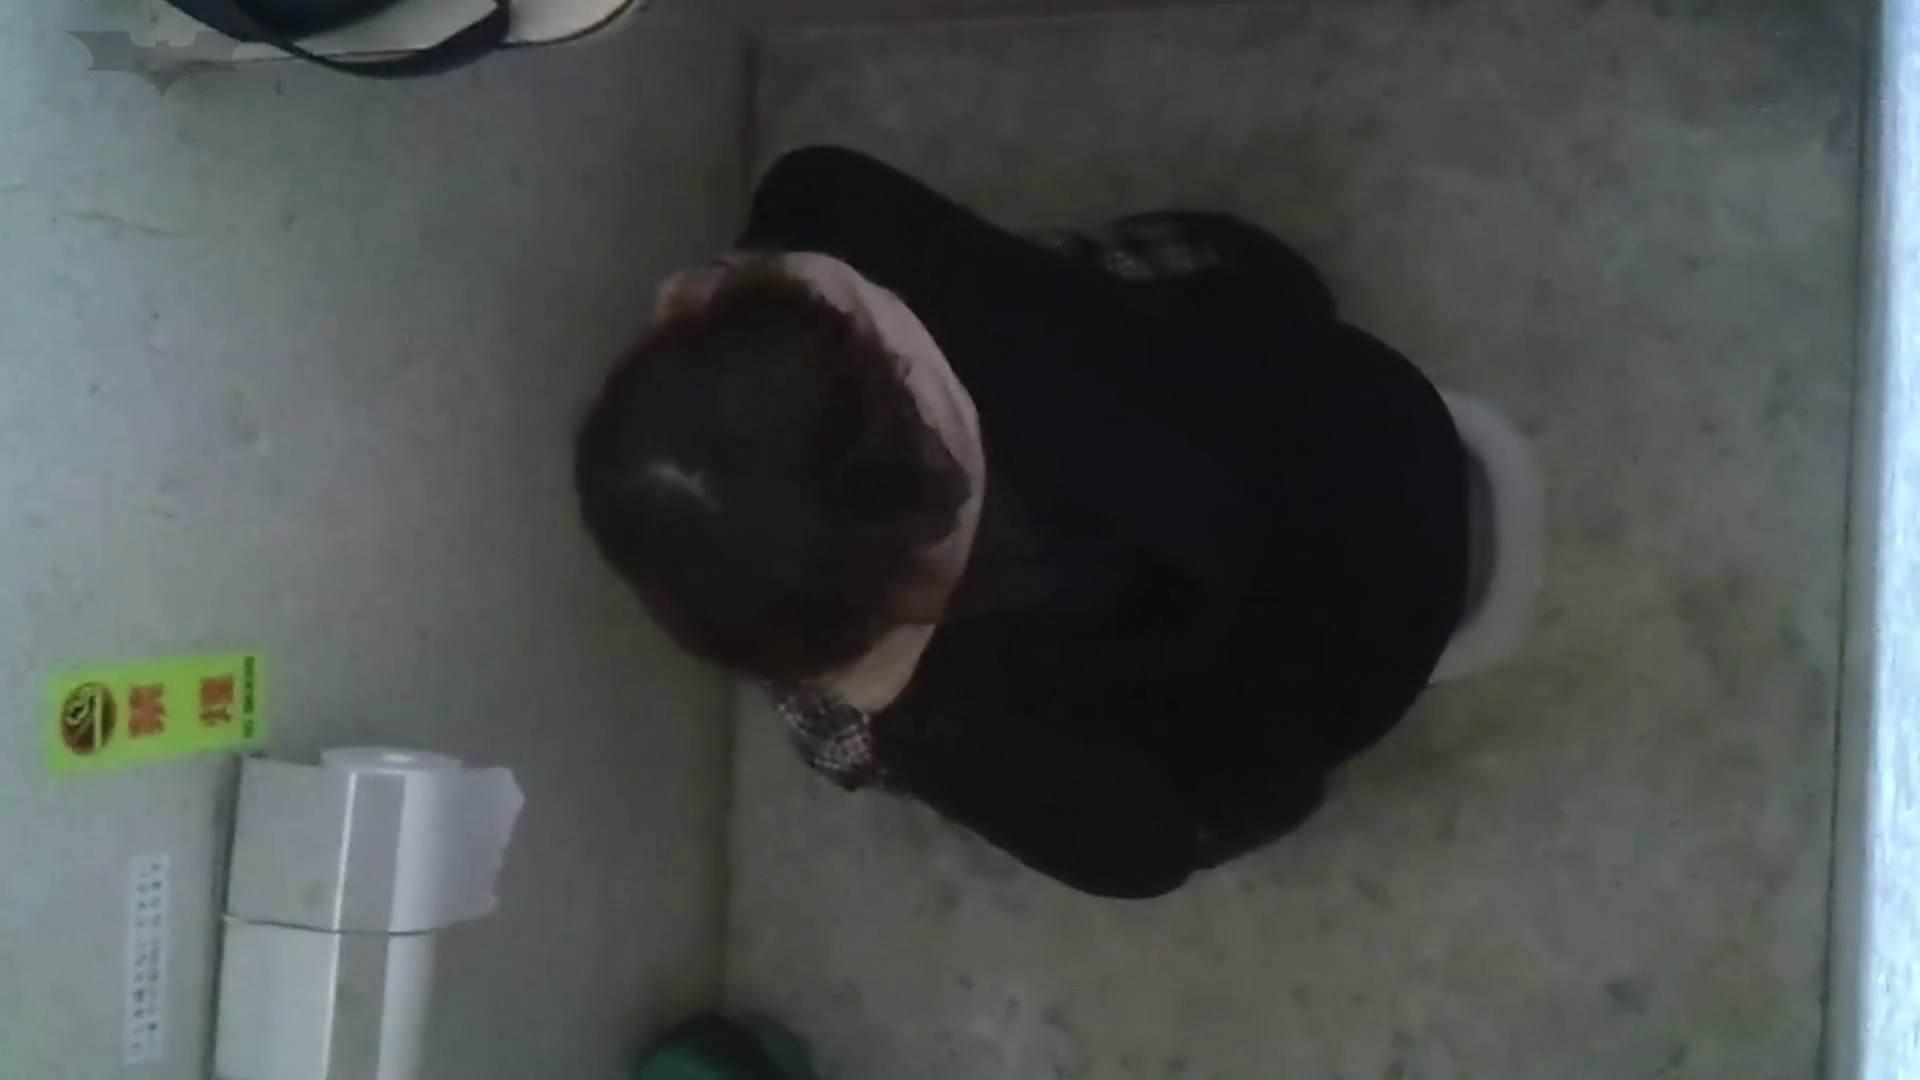 化粧室絵巻 番外編 VOL.14 ギャルズ 濡れ場動画紹介 75画像 74